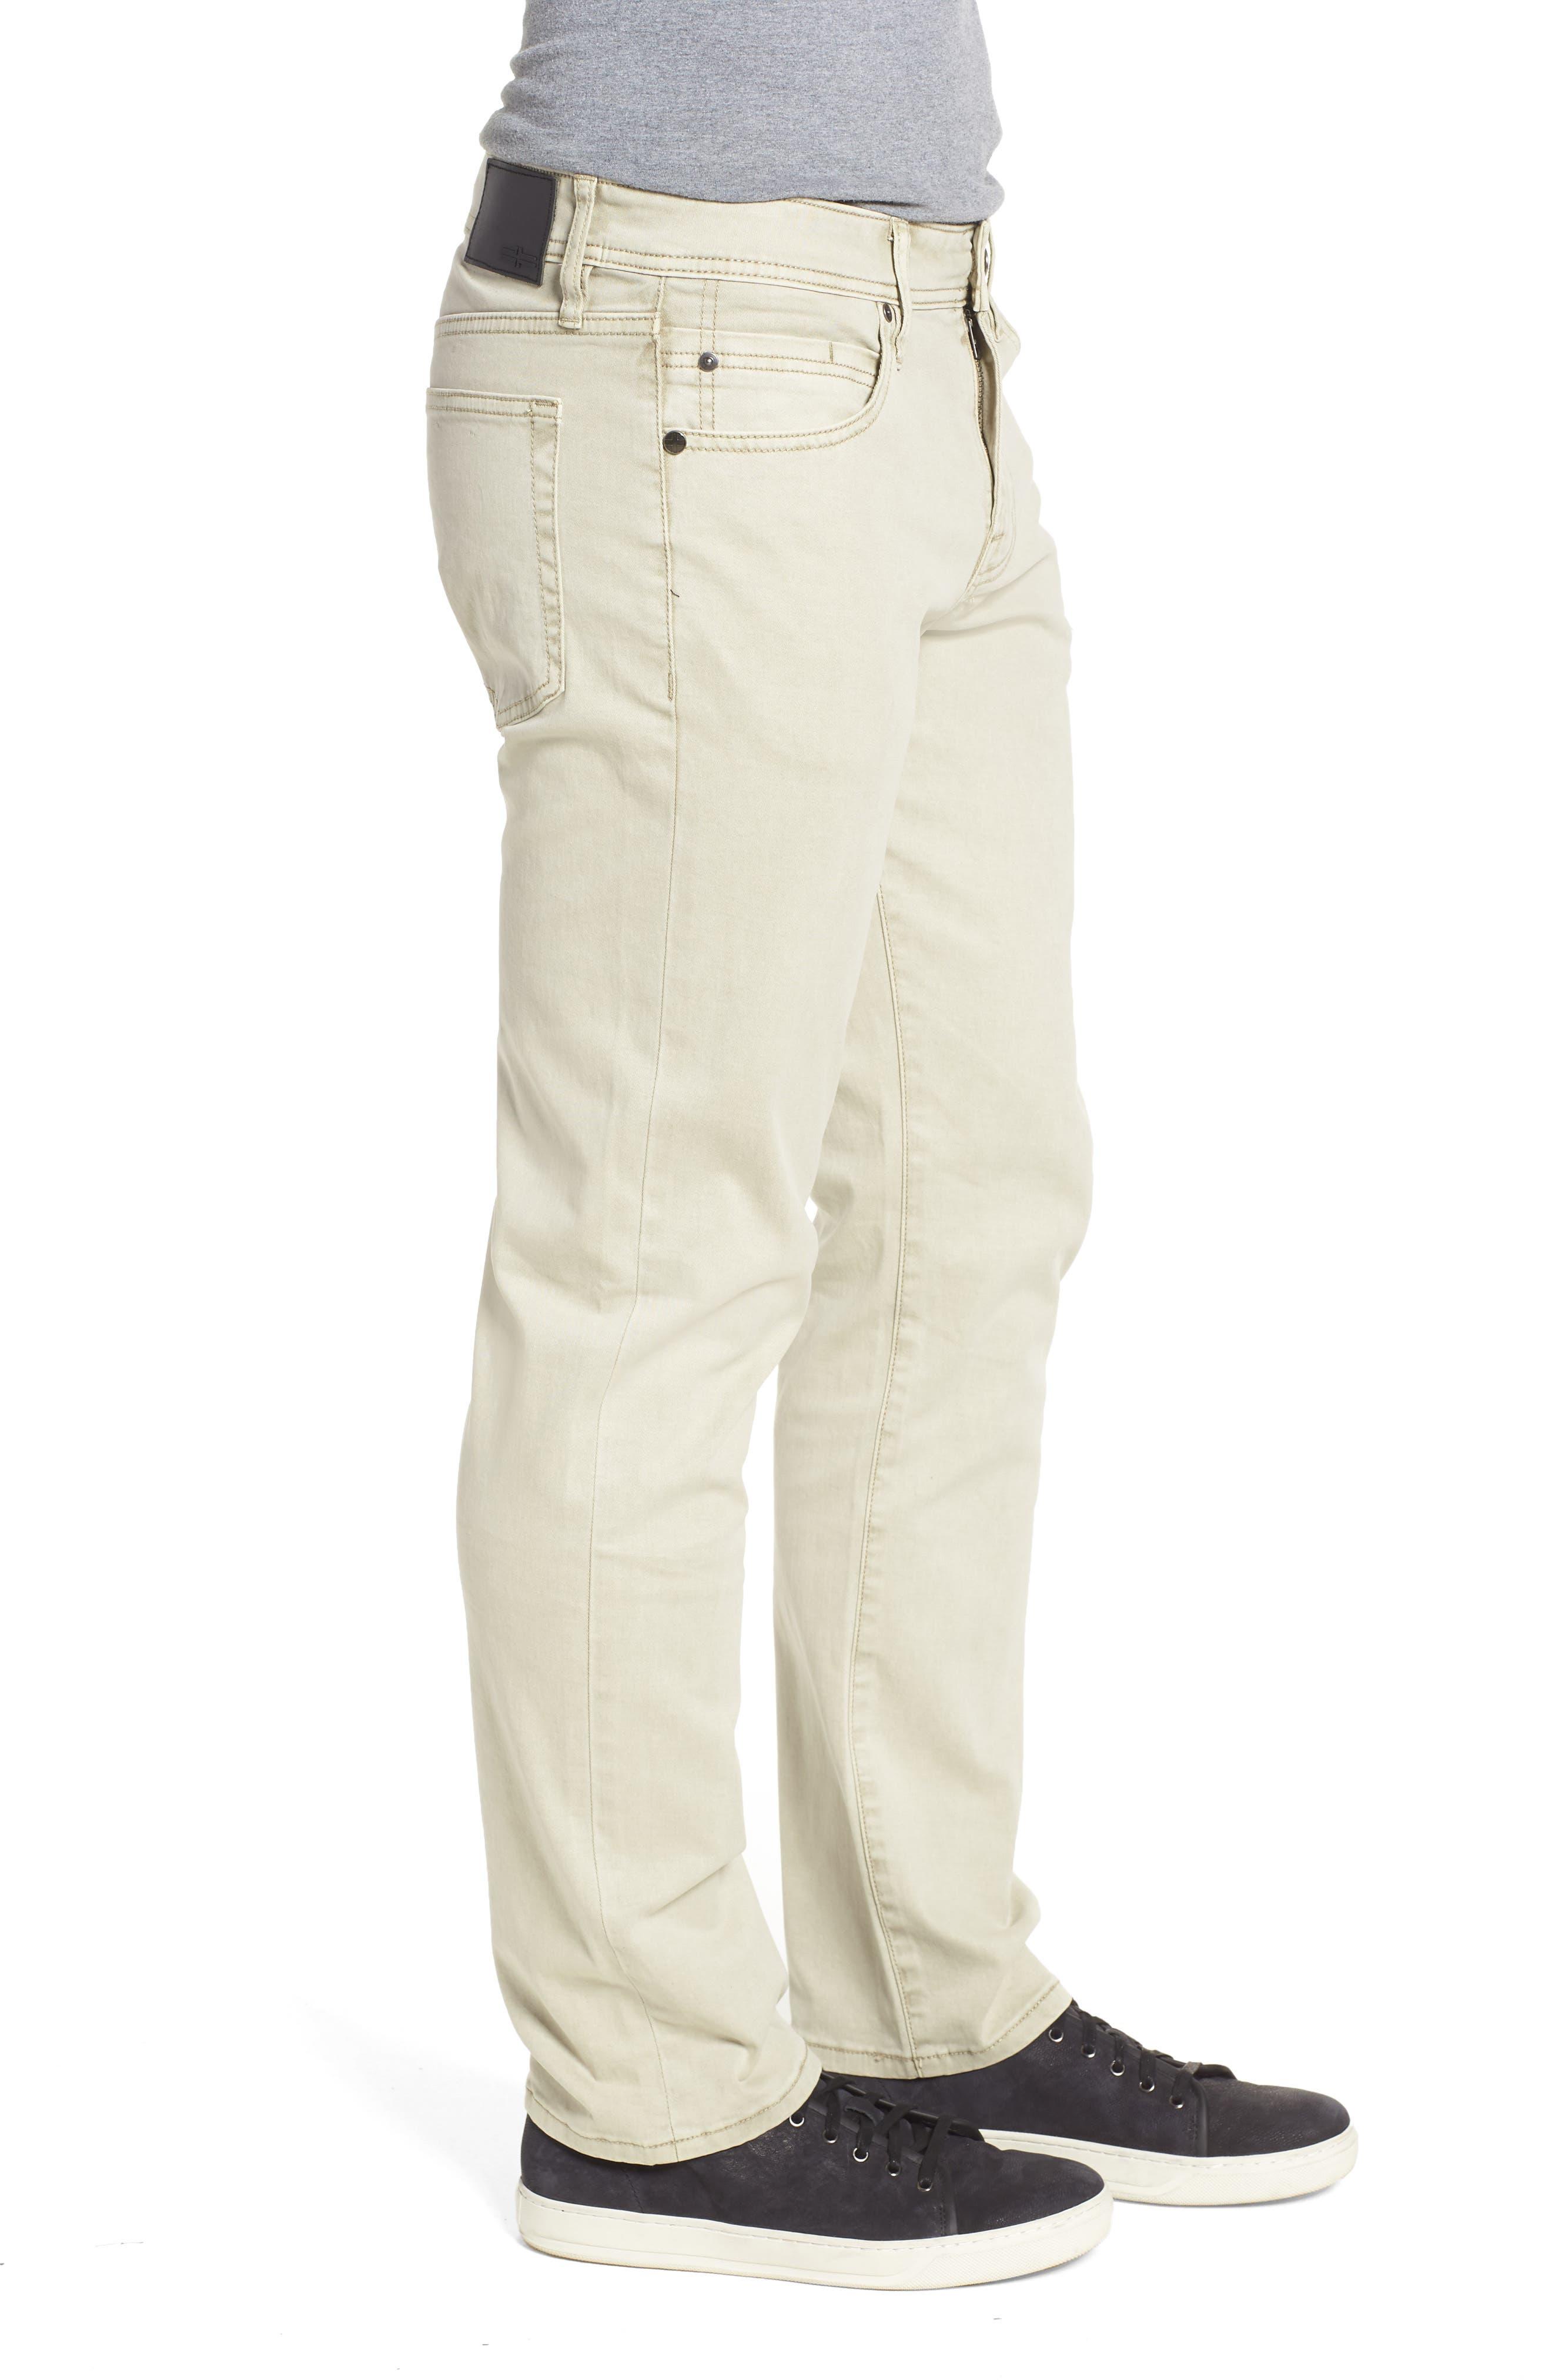 Jeans Co. Straight Leg Jeans,                             Alternate thumbnail 3, color,                             SANDSTROM